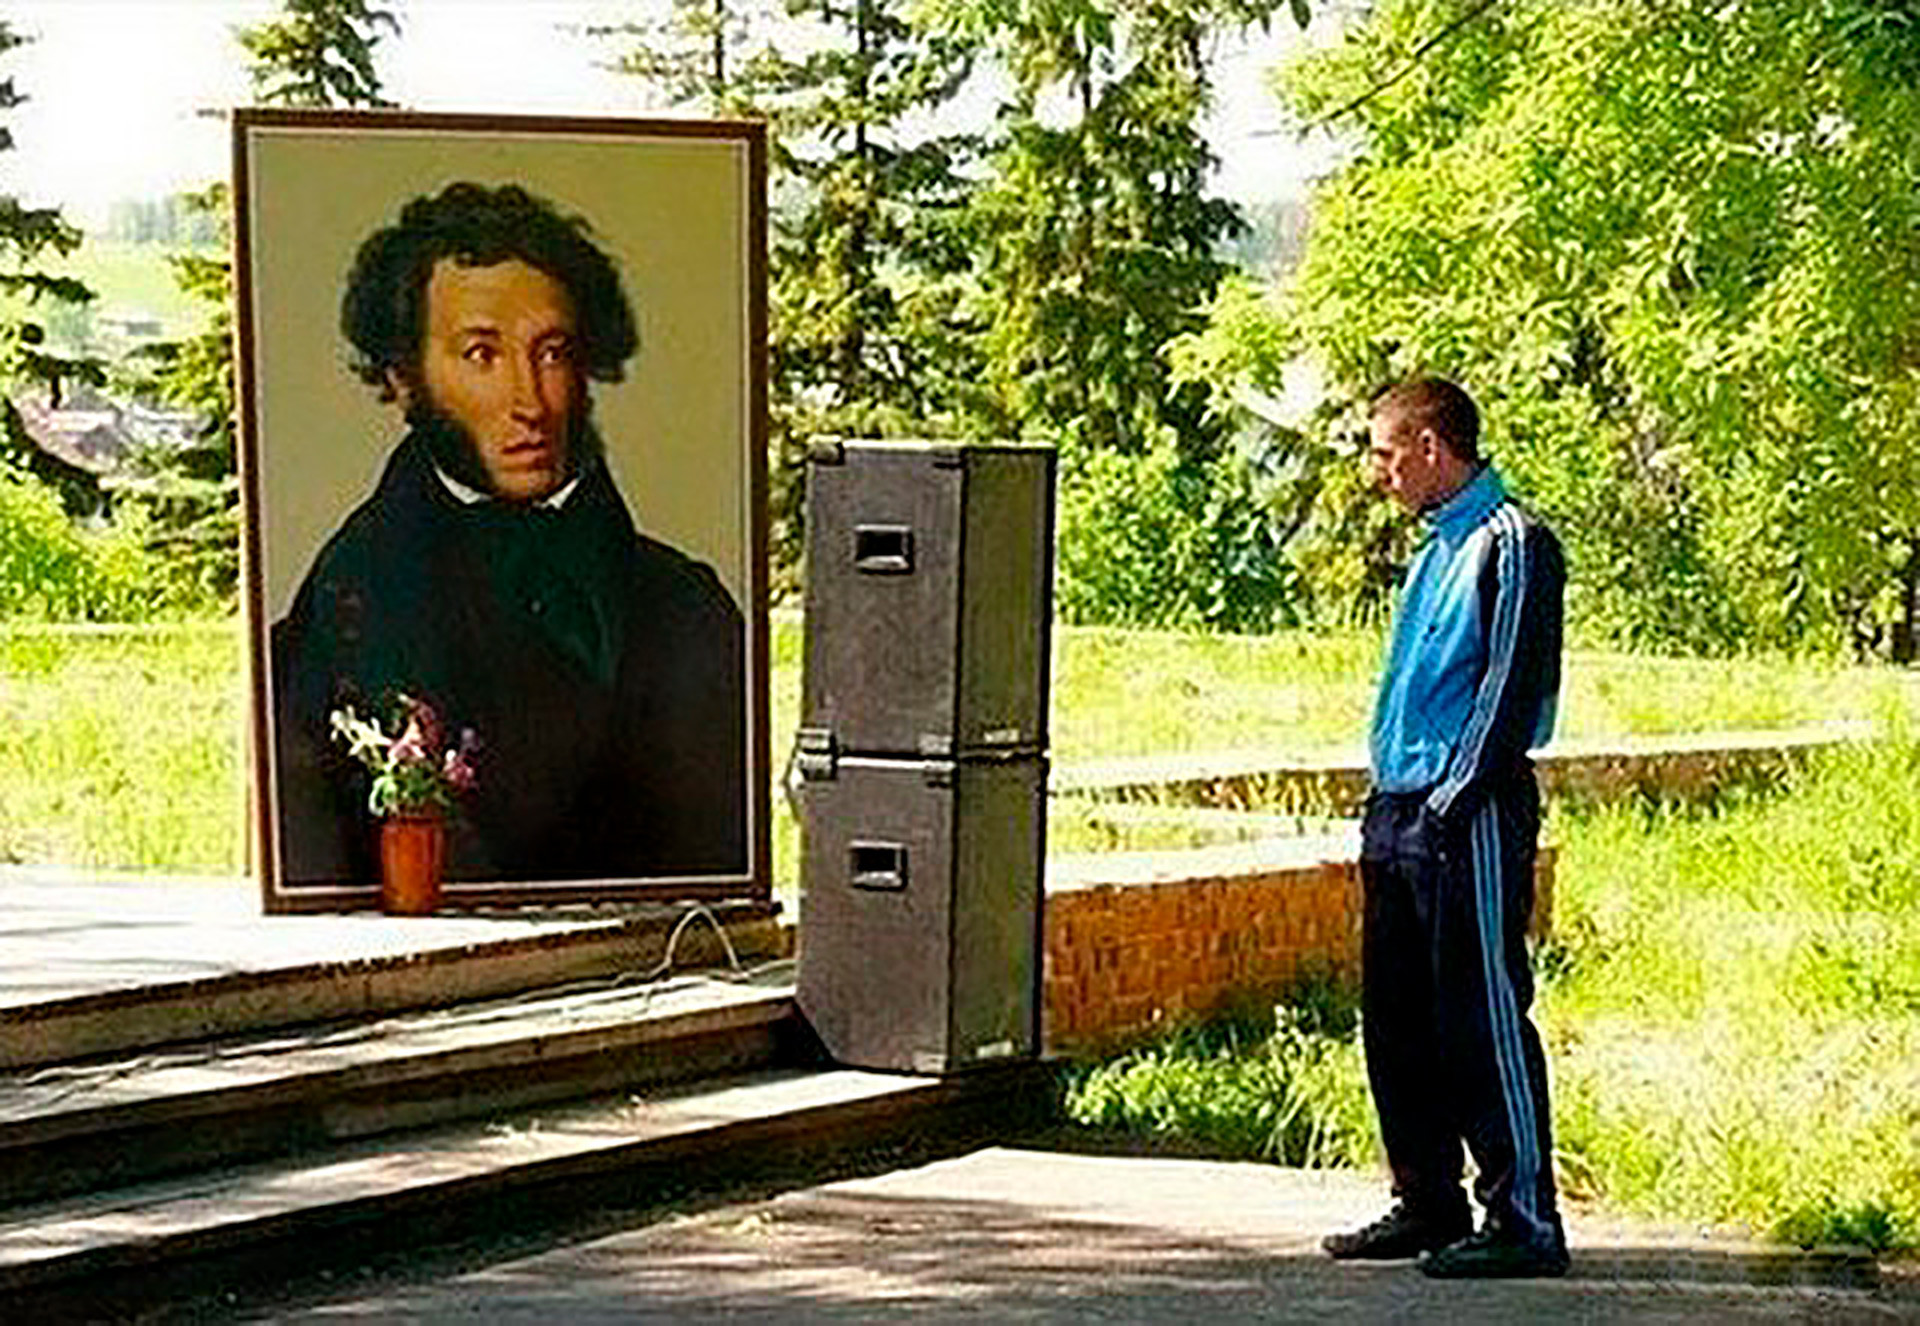 Predak (Aleksandar Puškin, najpoznatiji ruski pjesnik) i potomak (neki gopnik).